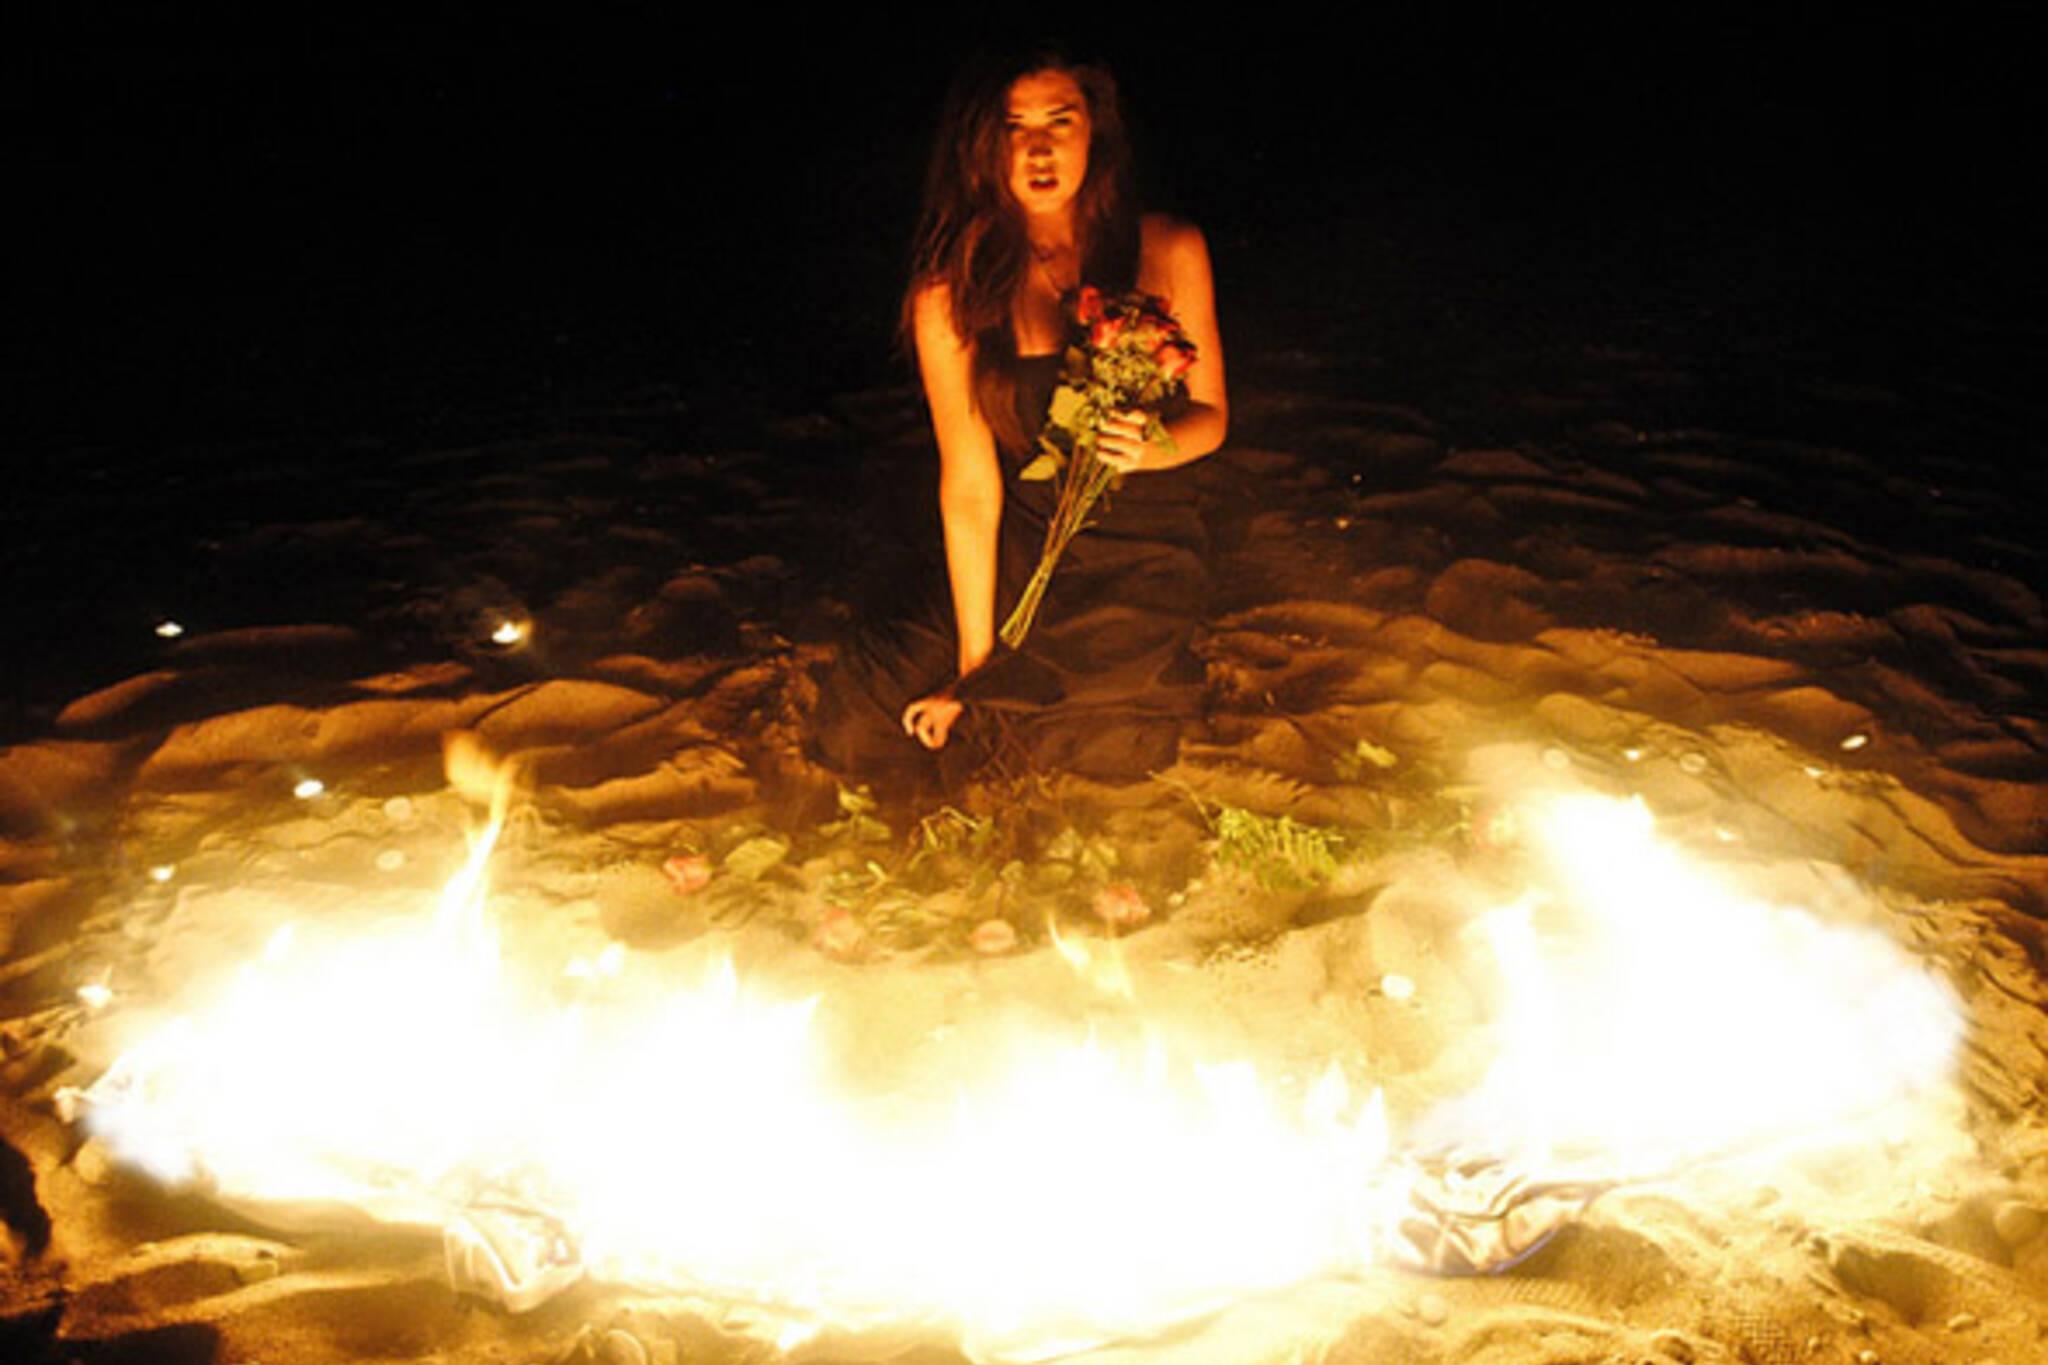 fire, flowers, girl